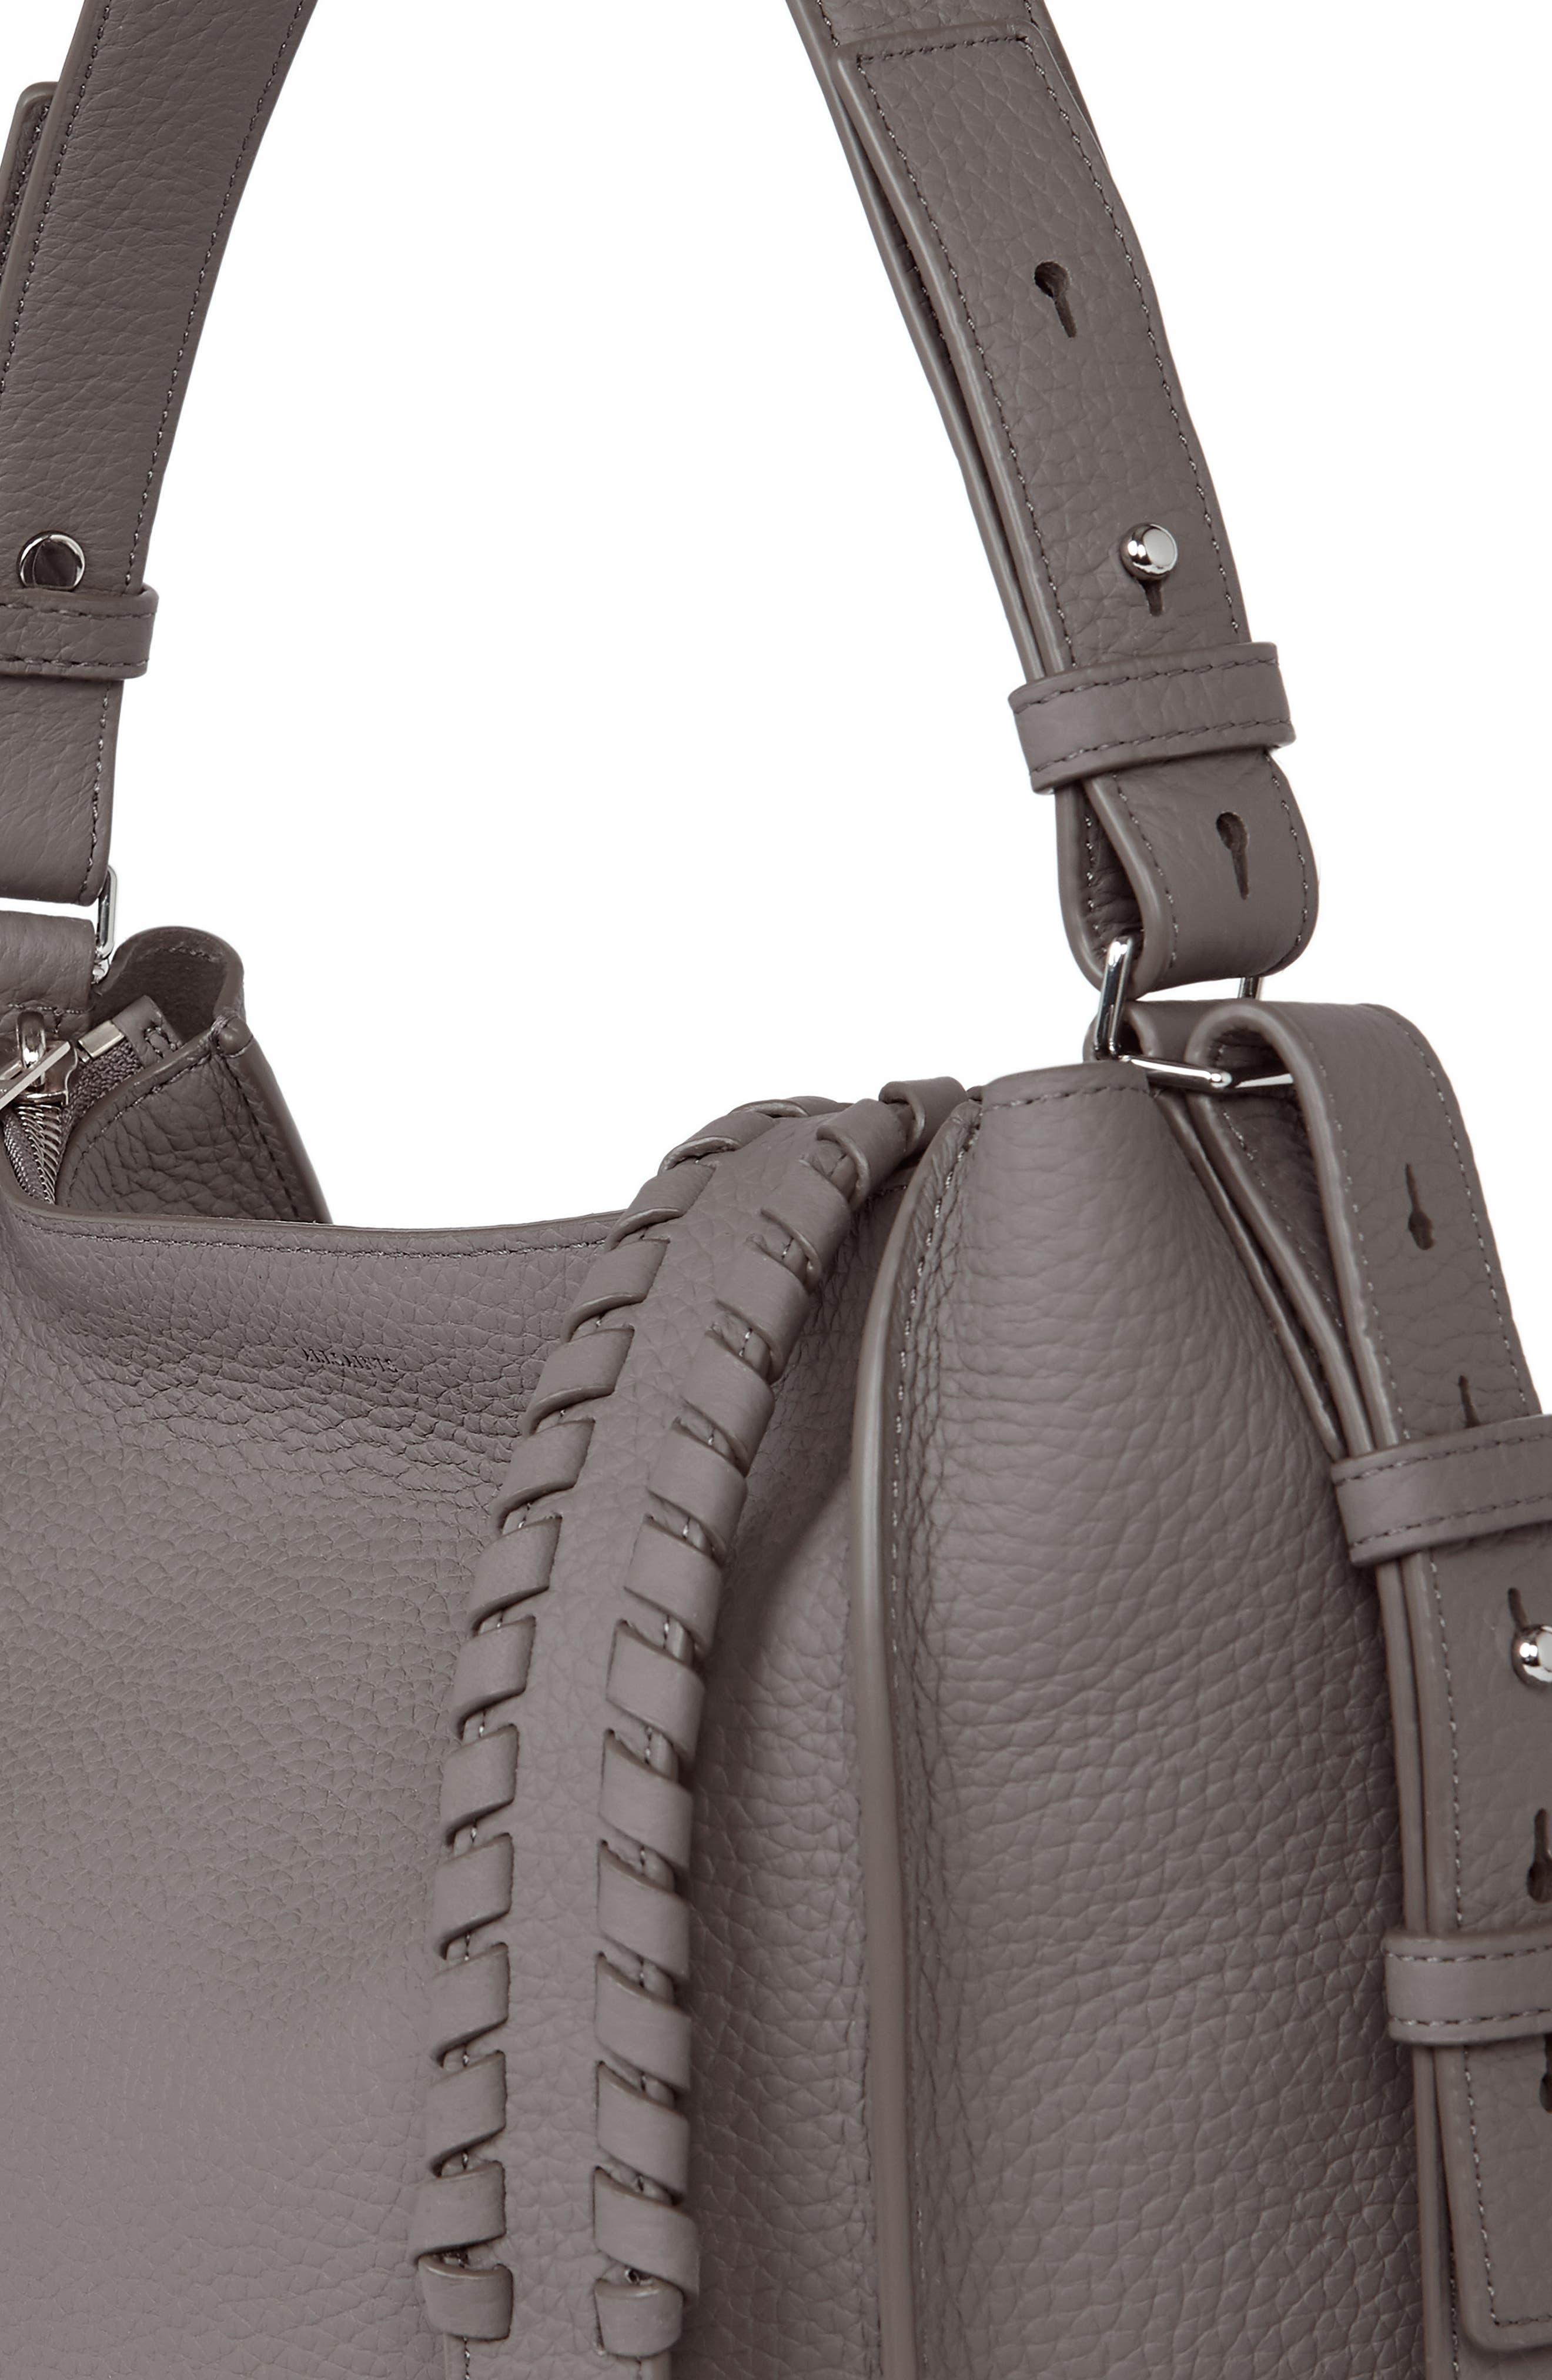 'Kita' Leather Shoulder/Crossbody Bag,                             Alternate thumbnail 4, color,                             STORM GREY